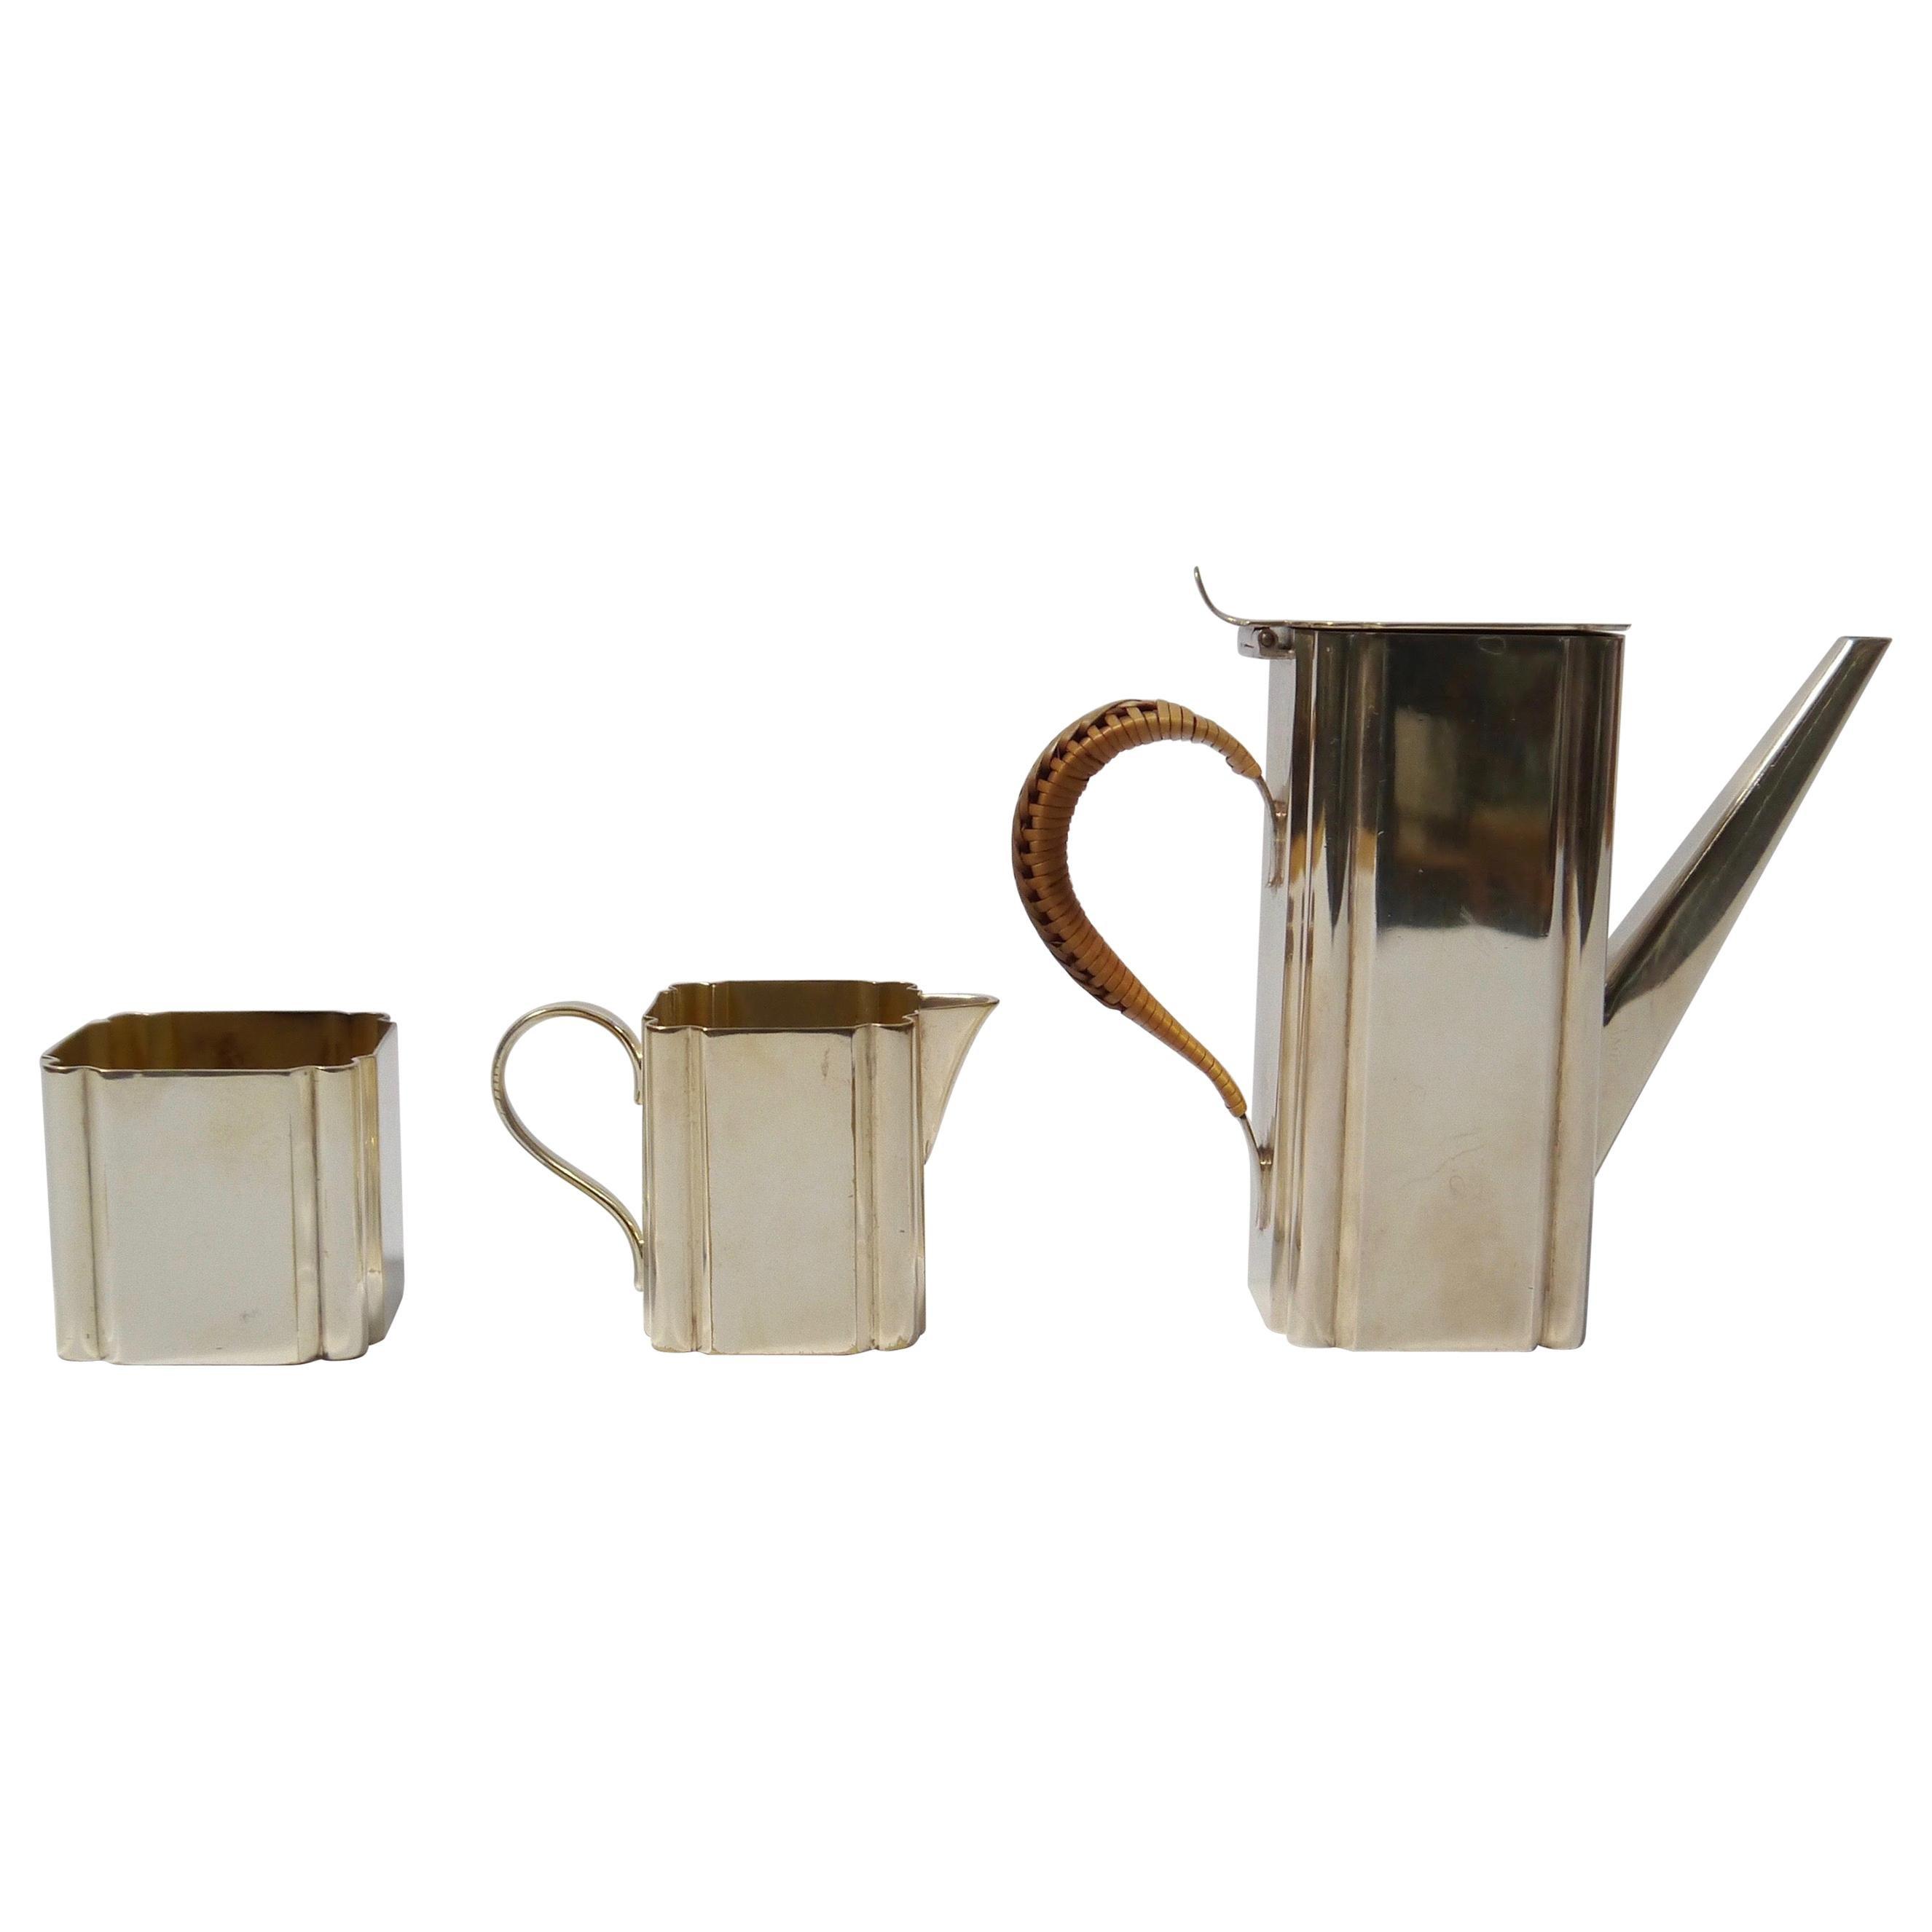 Art Deco Silver Plated Tea Set, Ro No 531588, England, 1930s